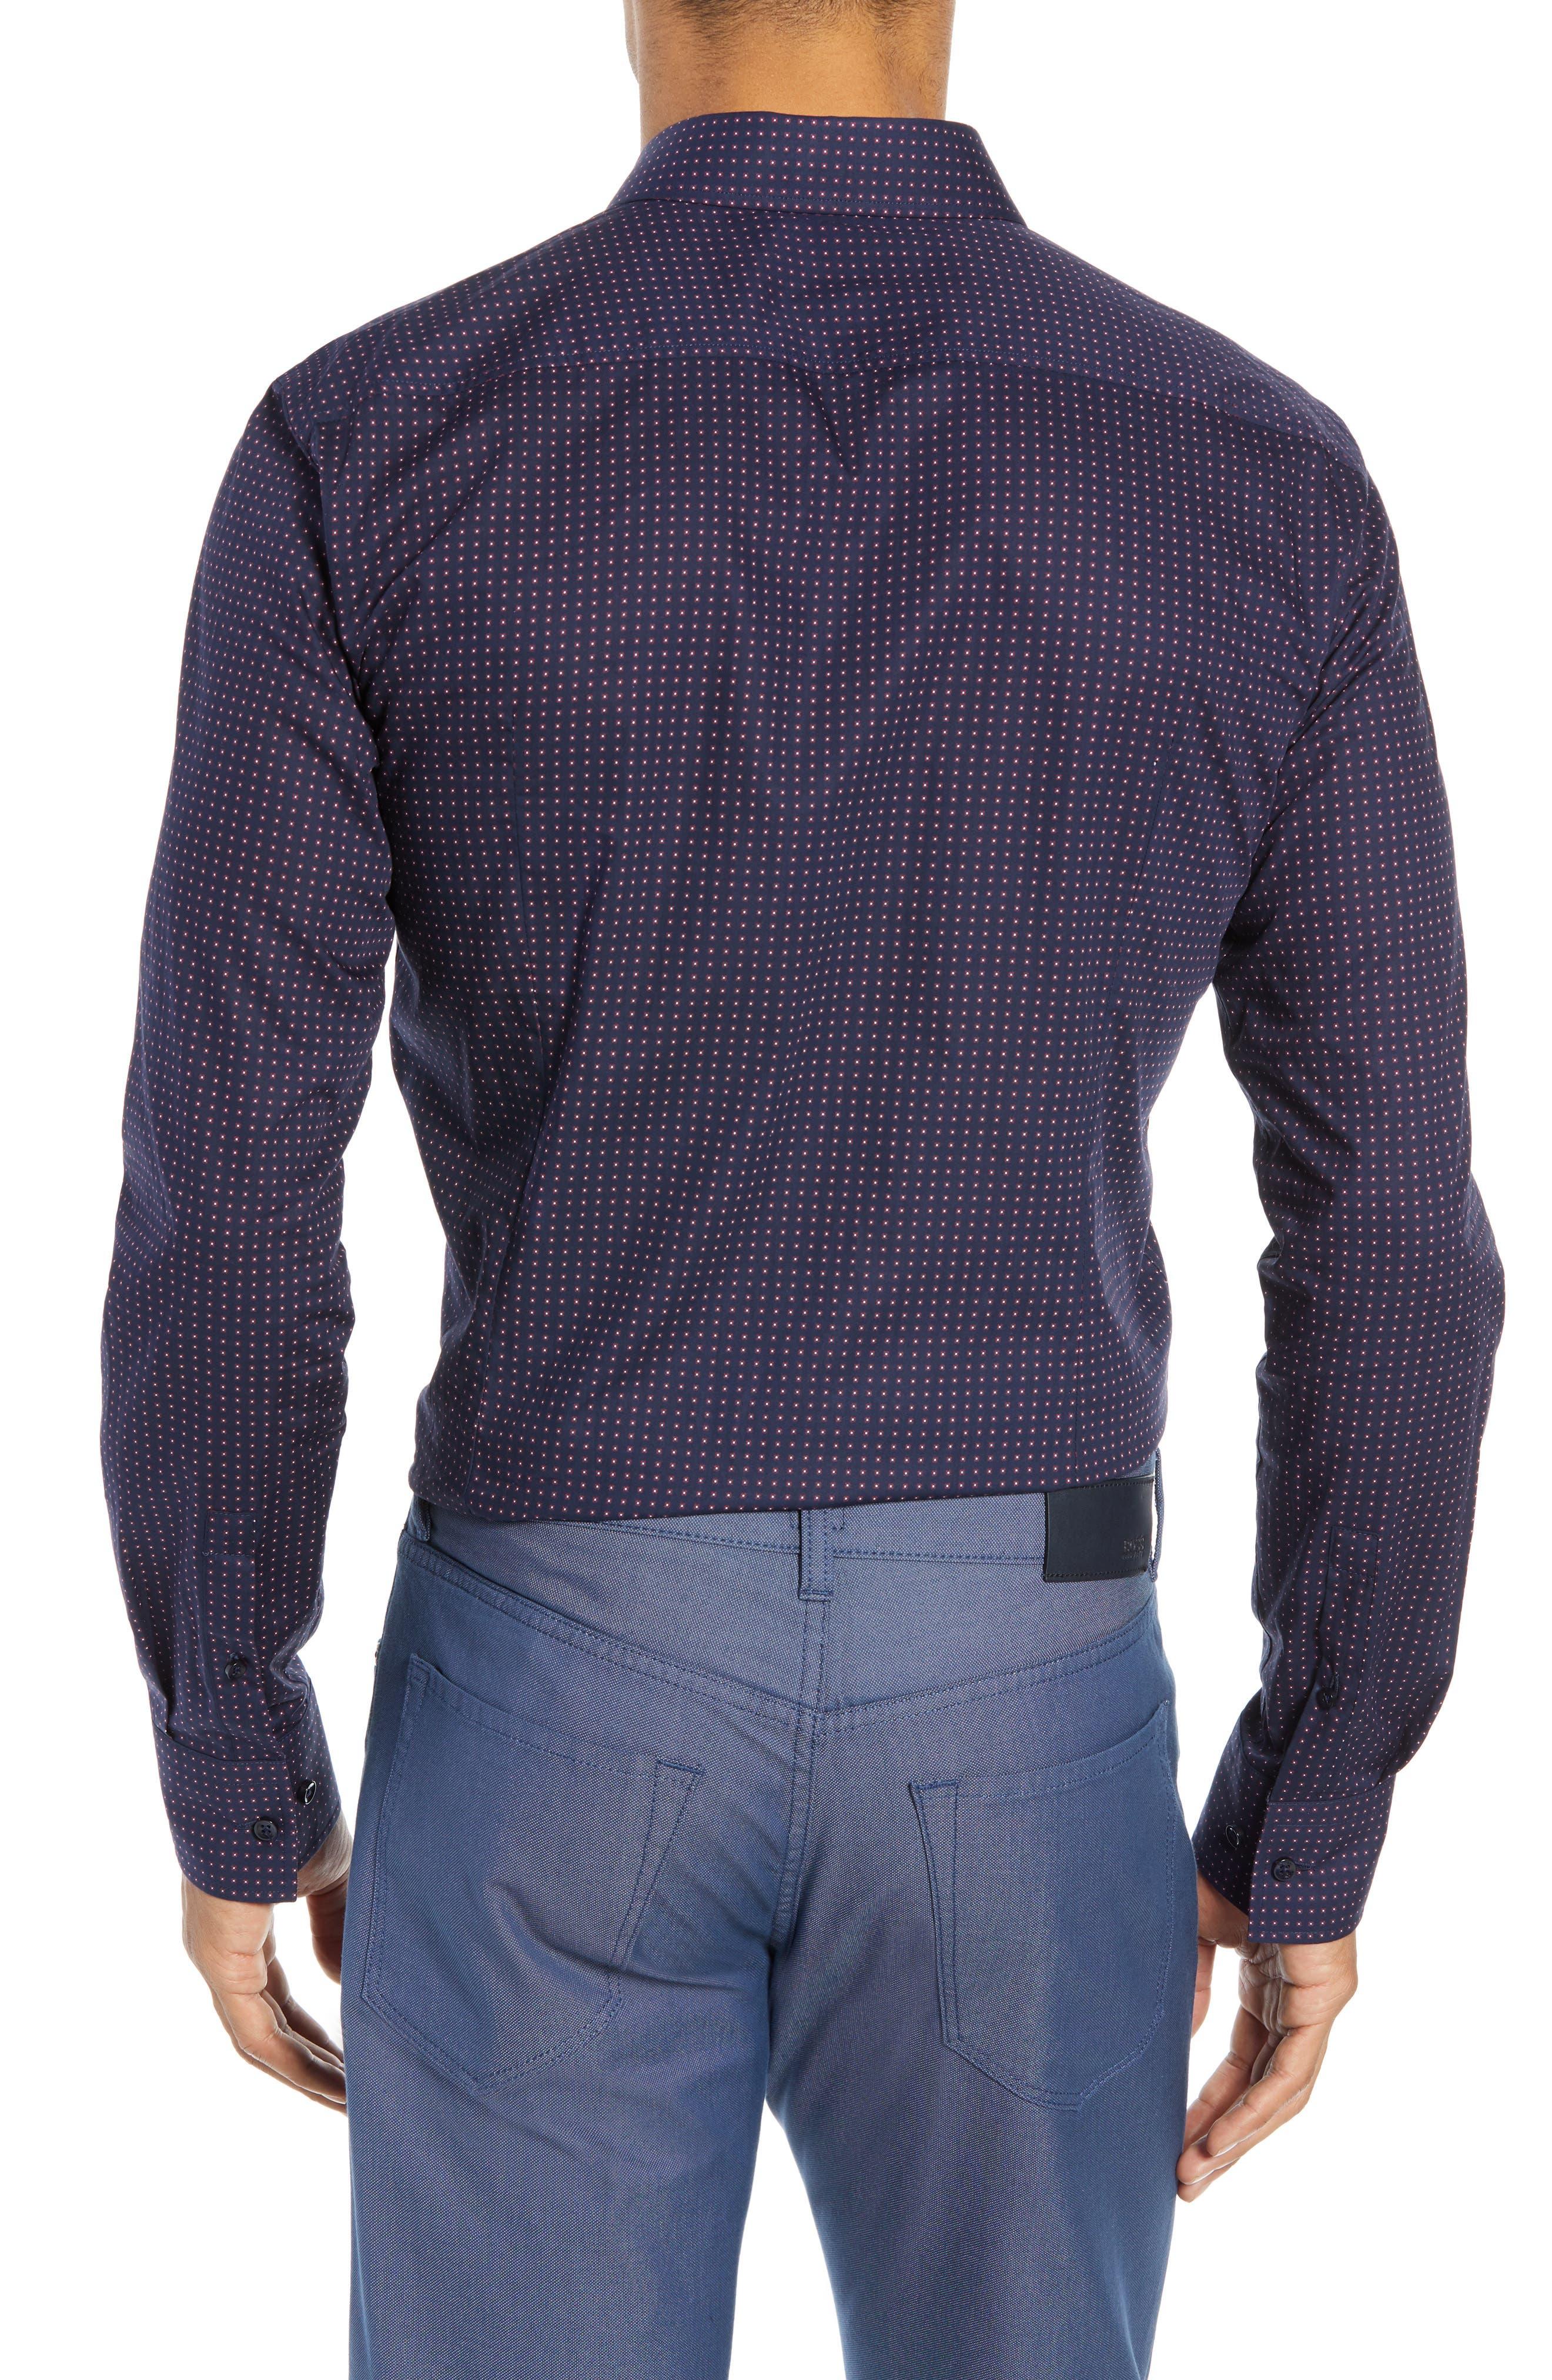 Jenno Slim Fit Dot Dress Shirt,                             Alternate thumbnail 3, color,                             NAVY